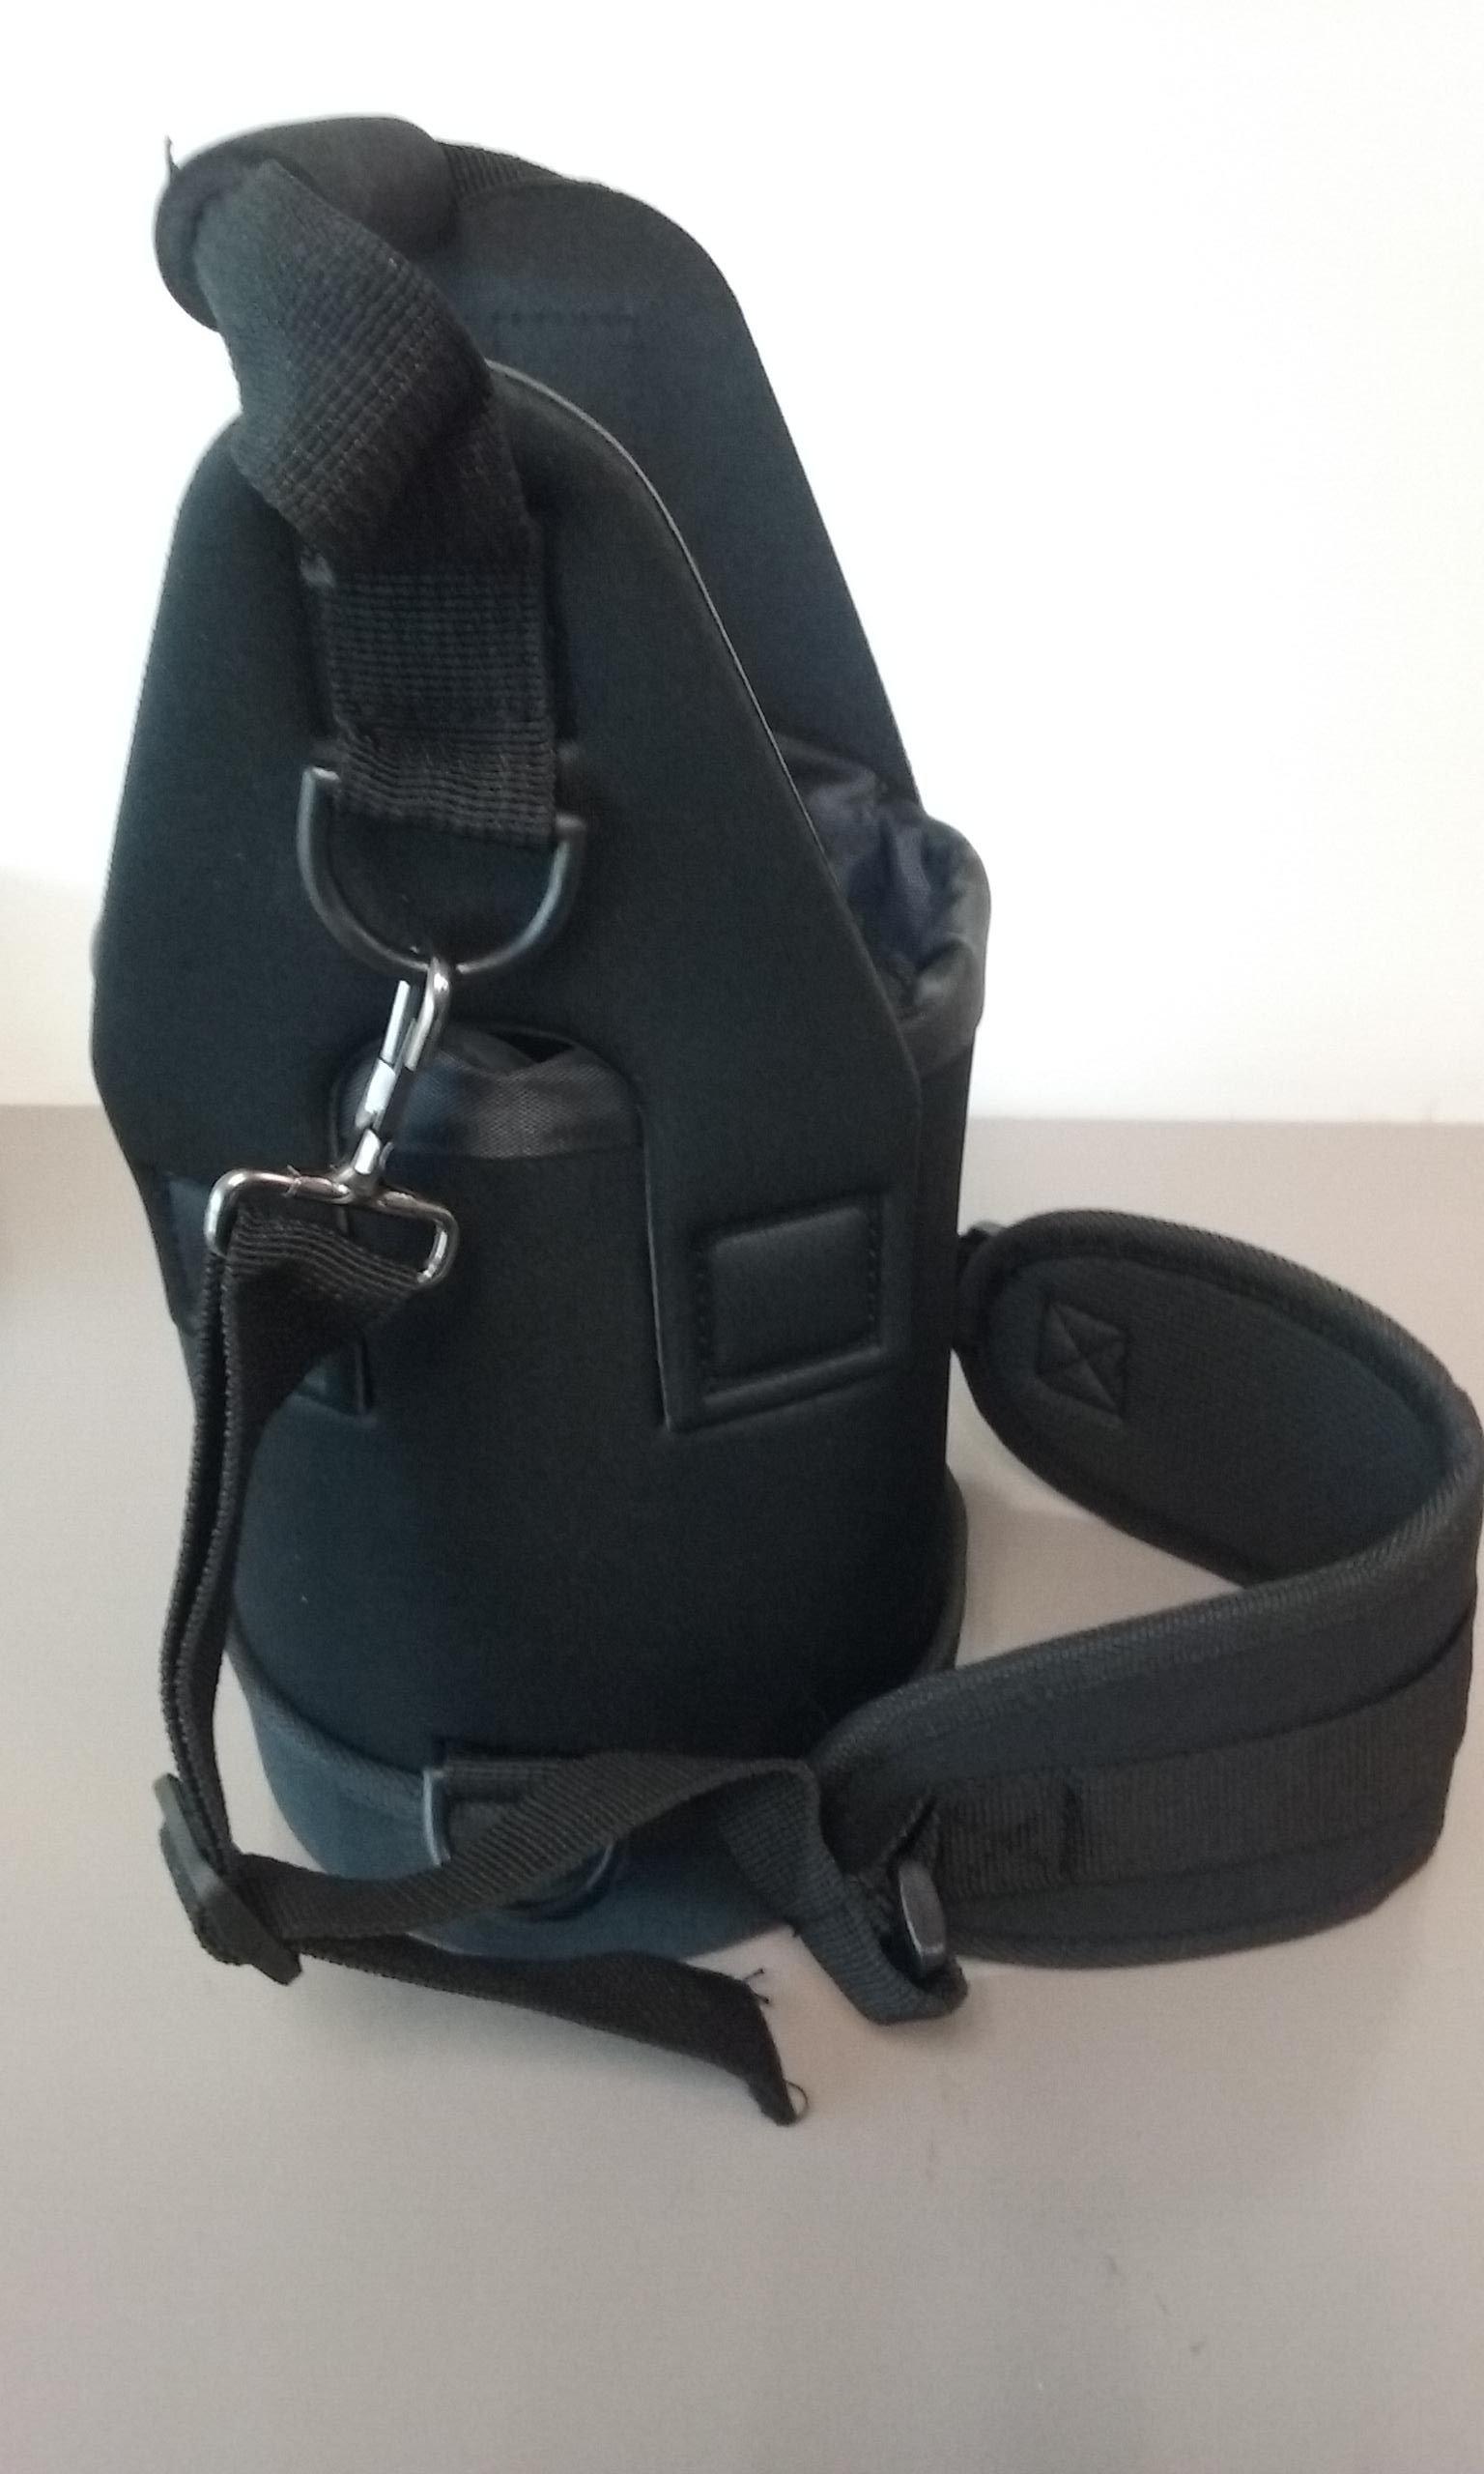 Cramer Decker Medical Homefill ML6 Cylinder Bag (Black)